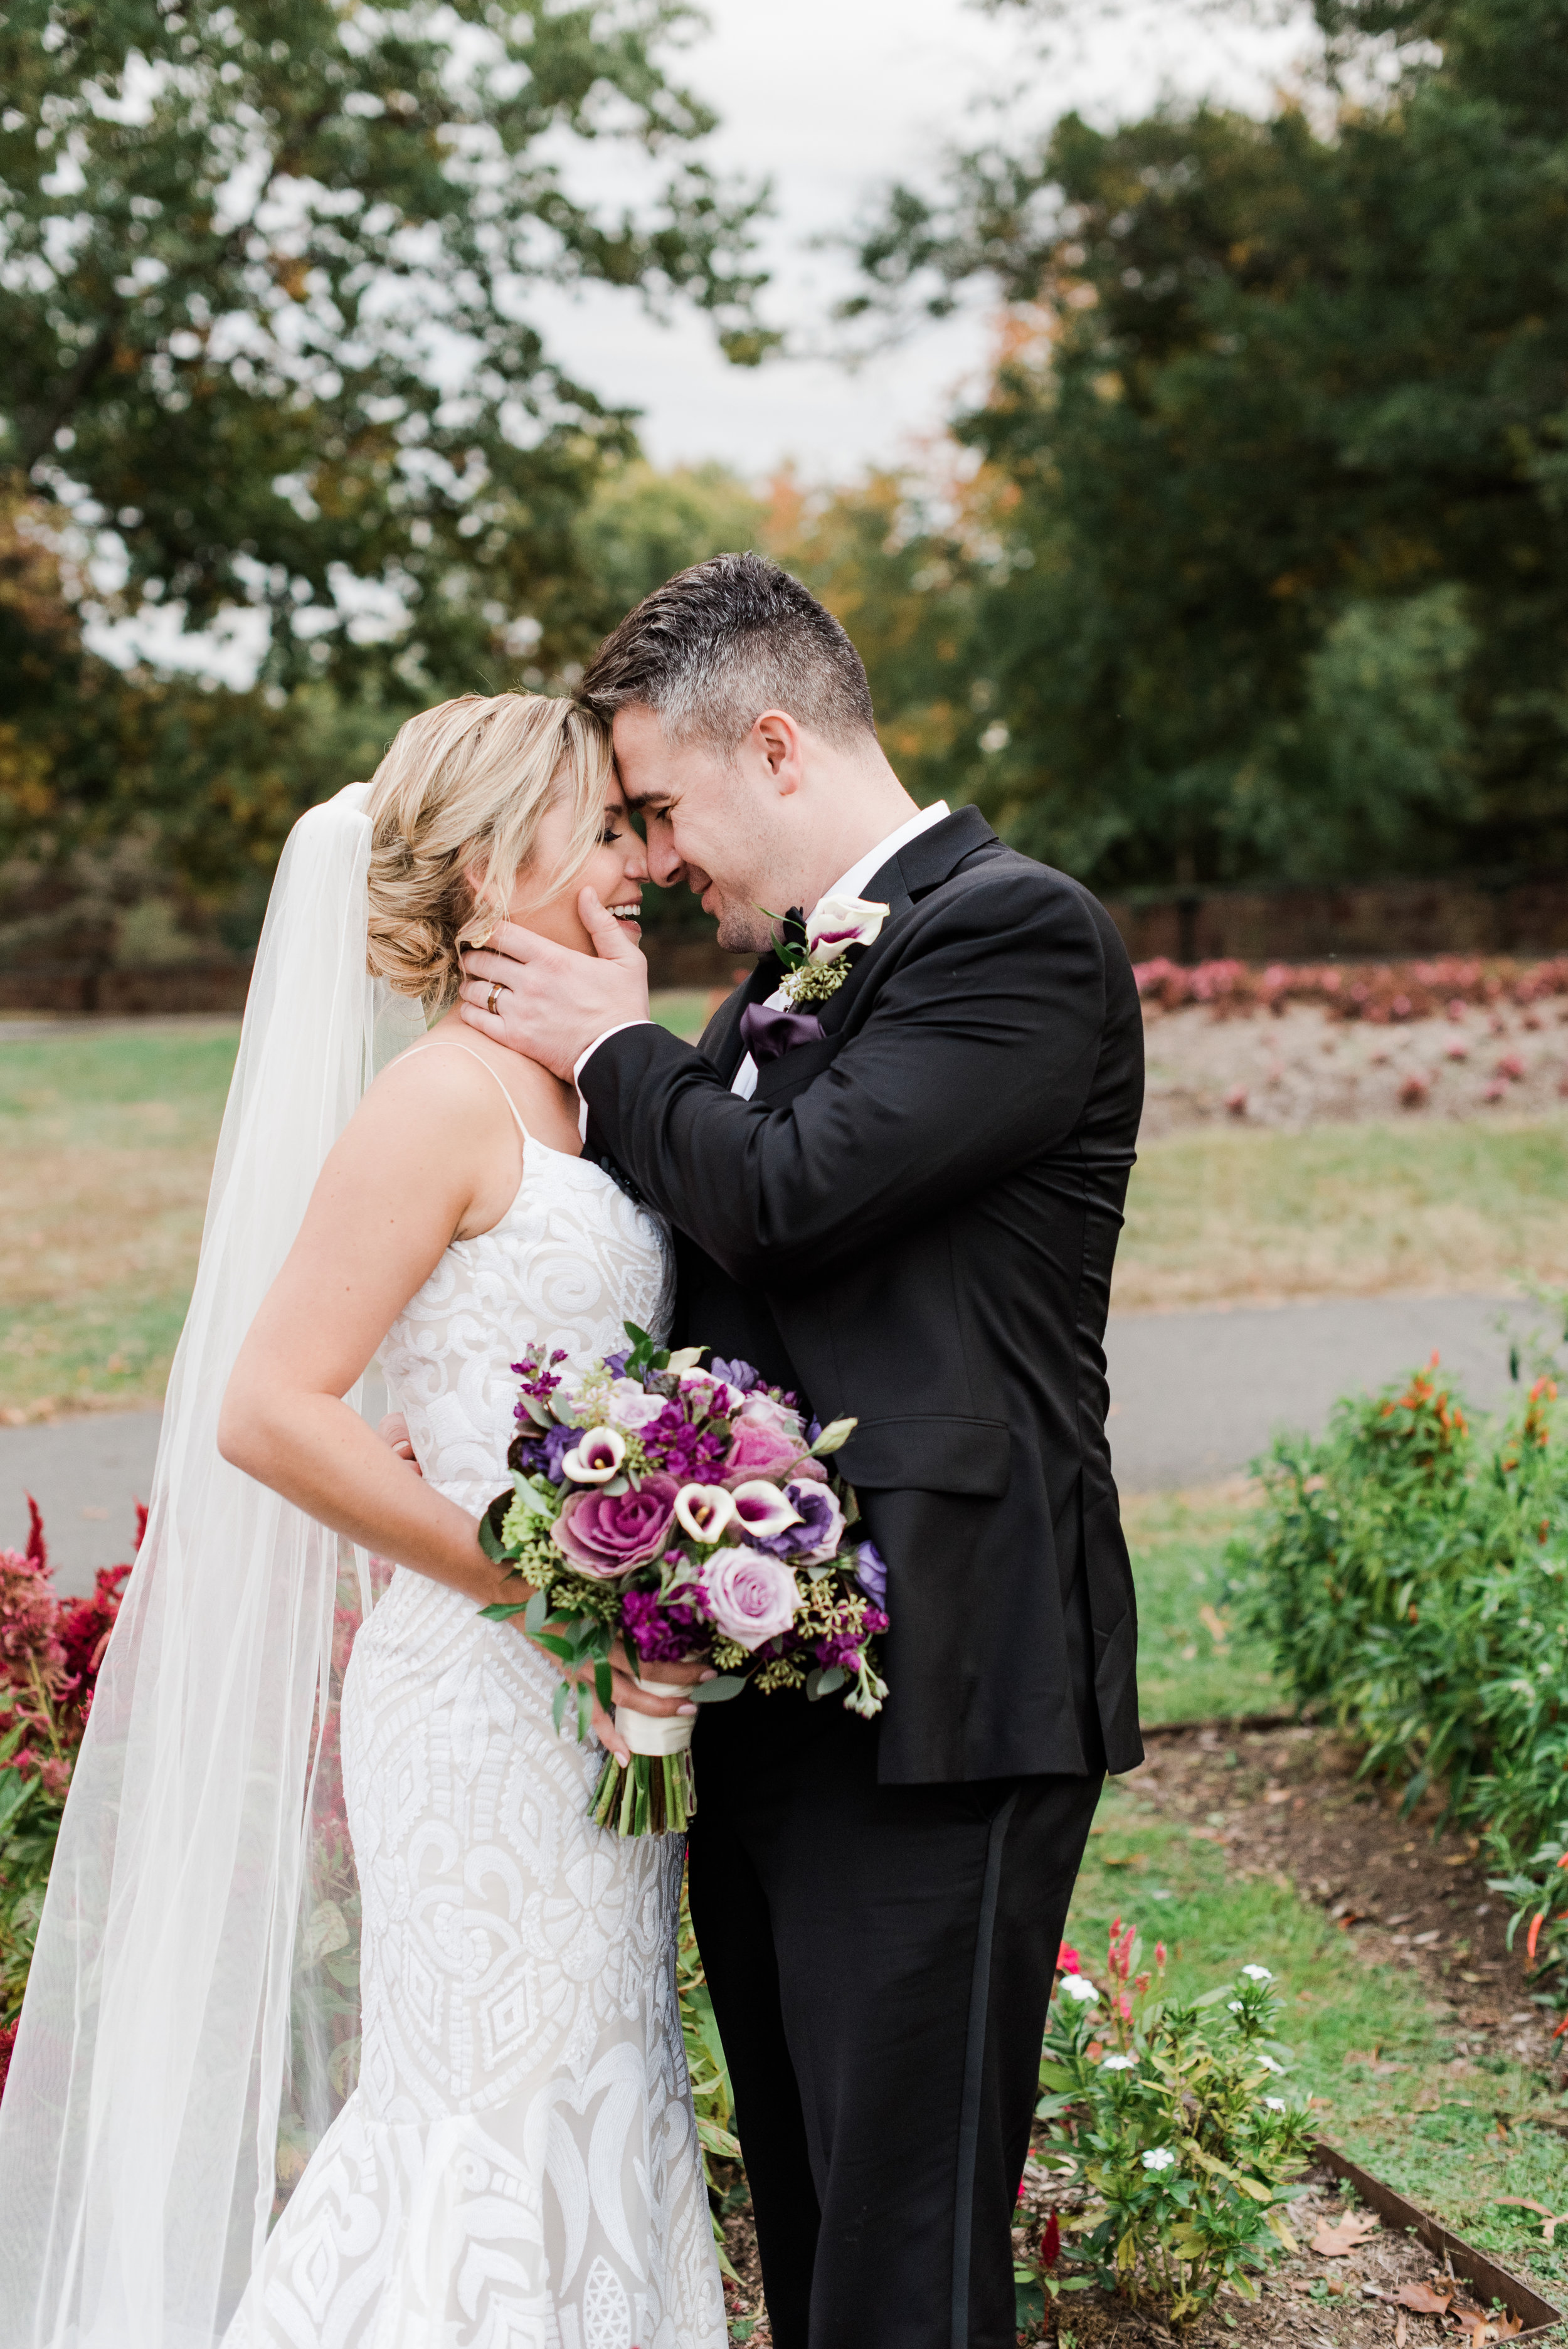 DavidAmandaMundy-Wedding-10282017-KathrynIvyPhotography-385.jpg